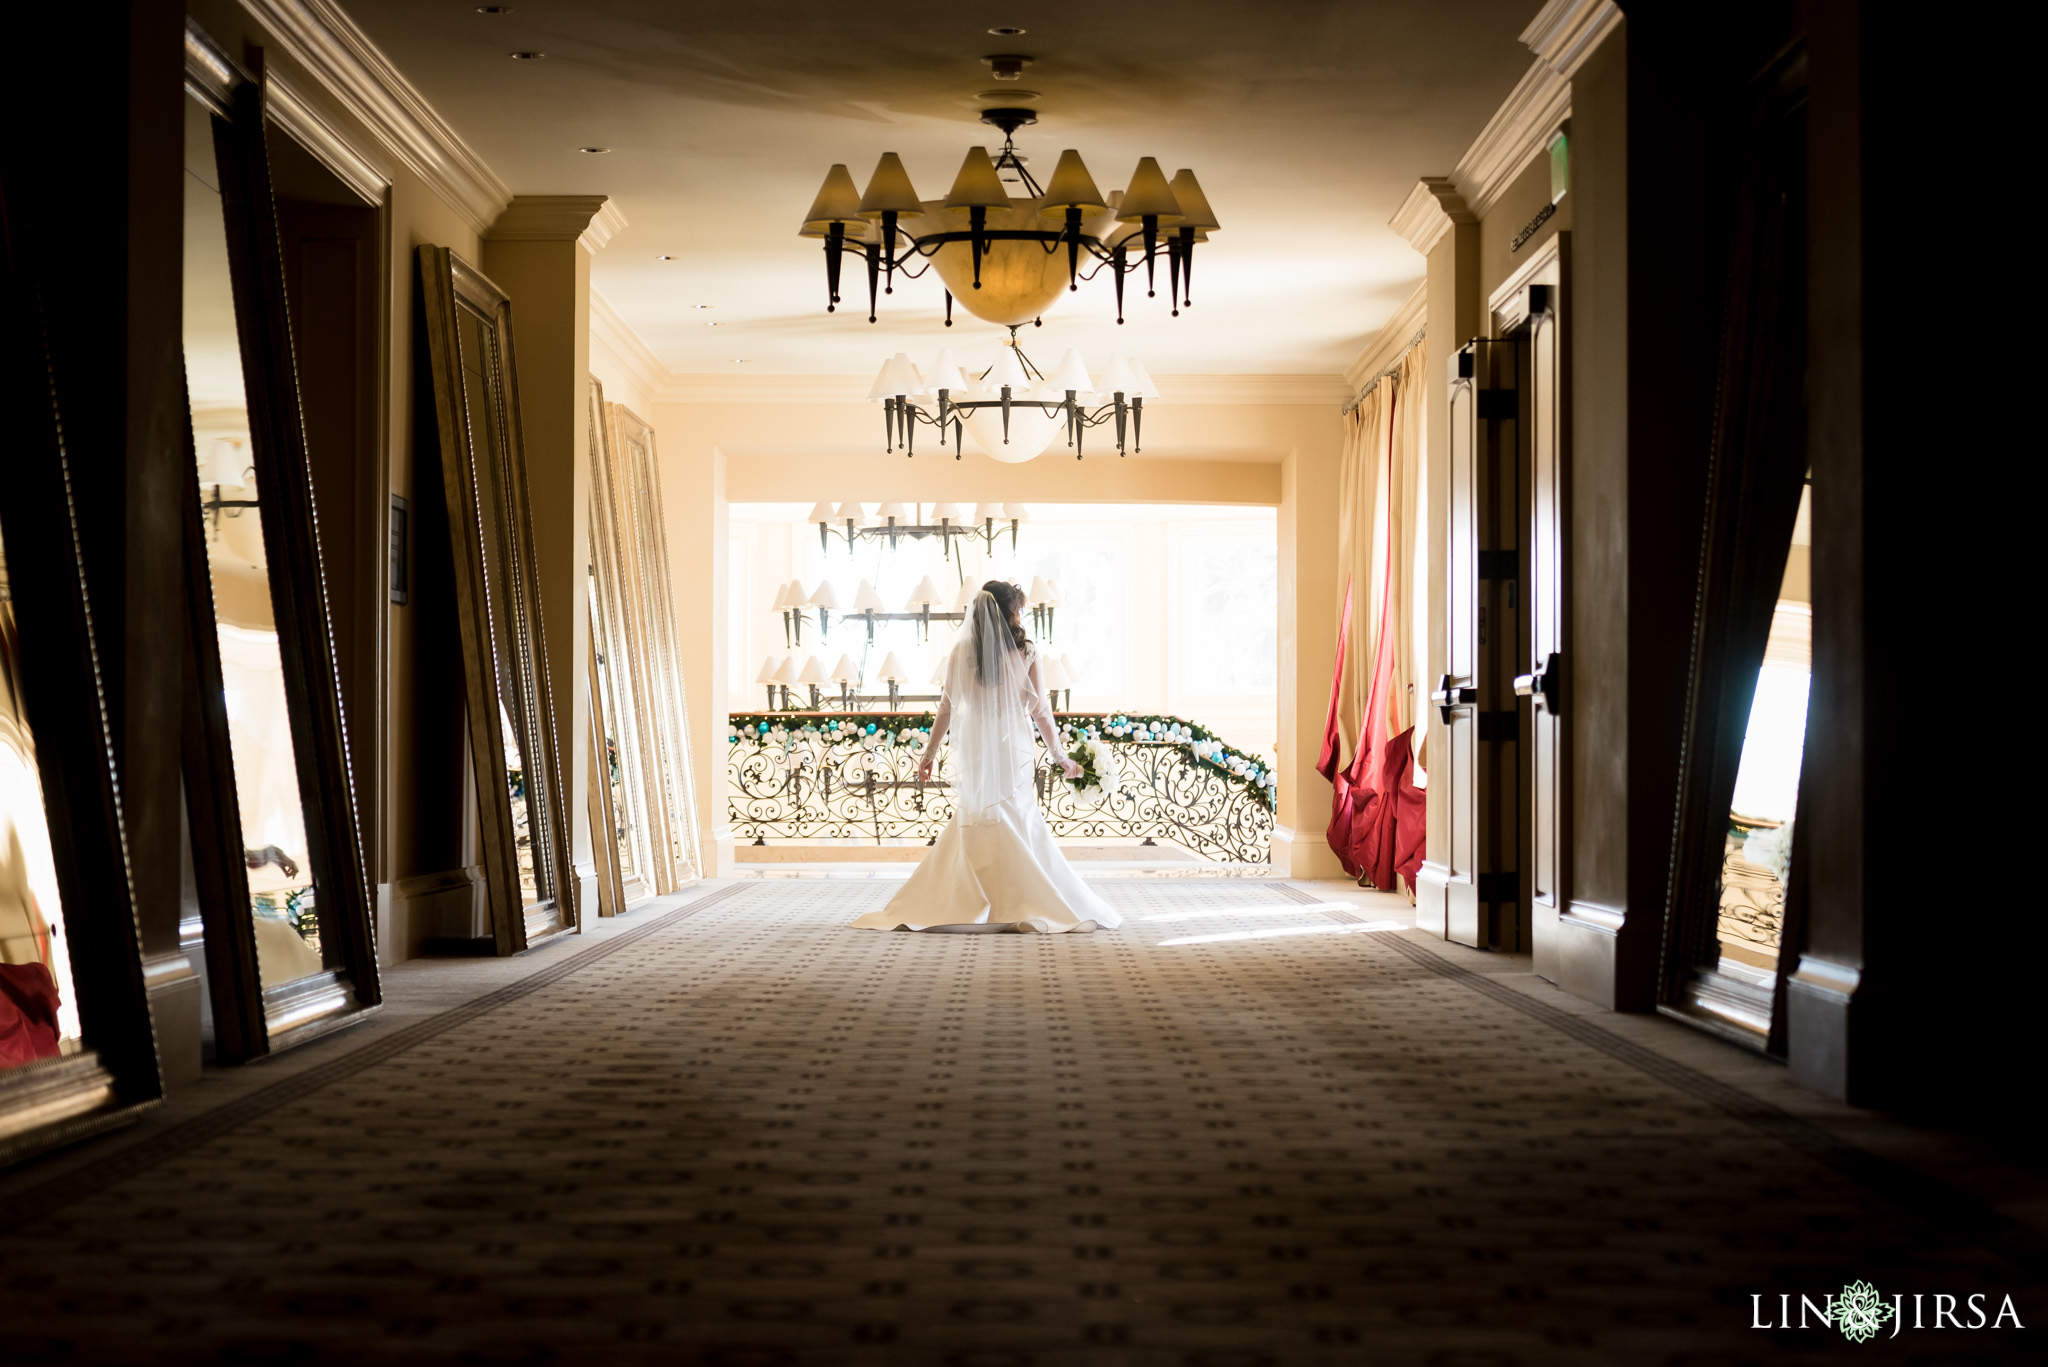 01-monarch-beach-resort-wish-upon-a-wedding-photography